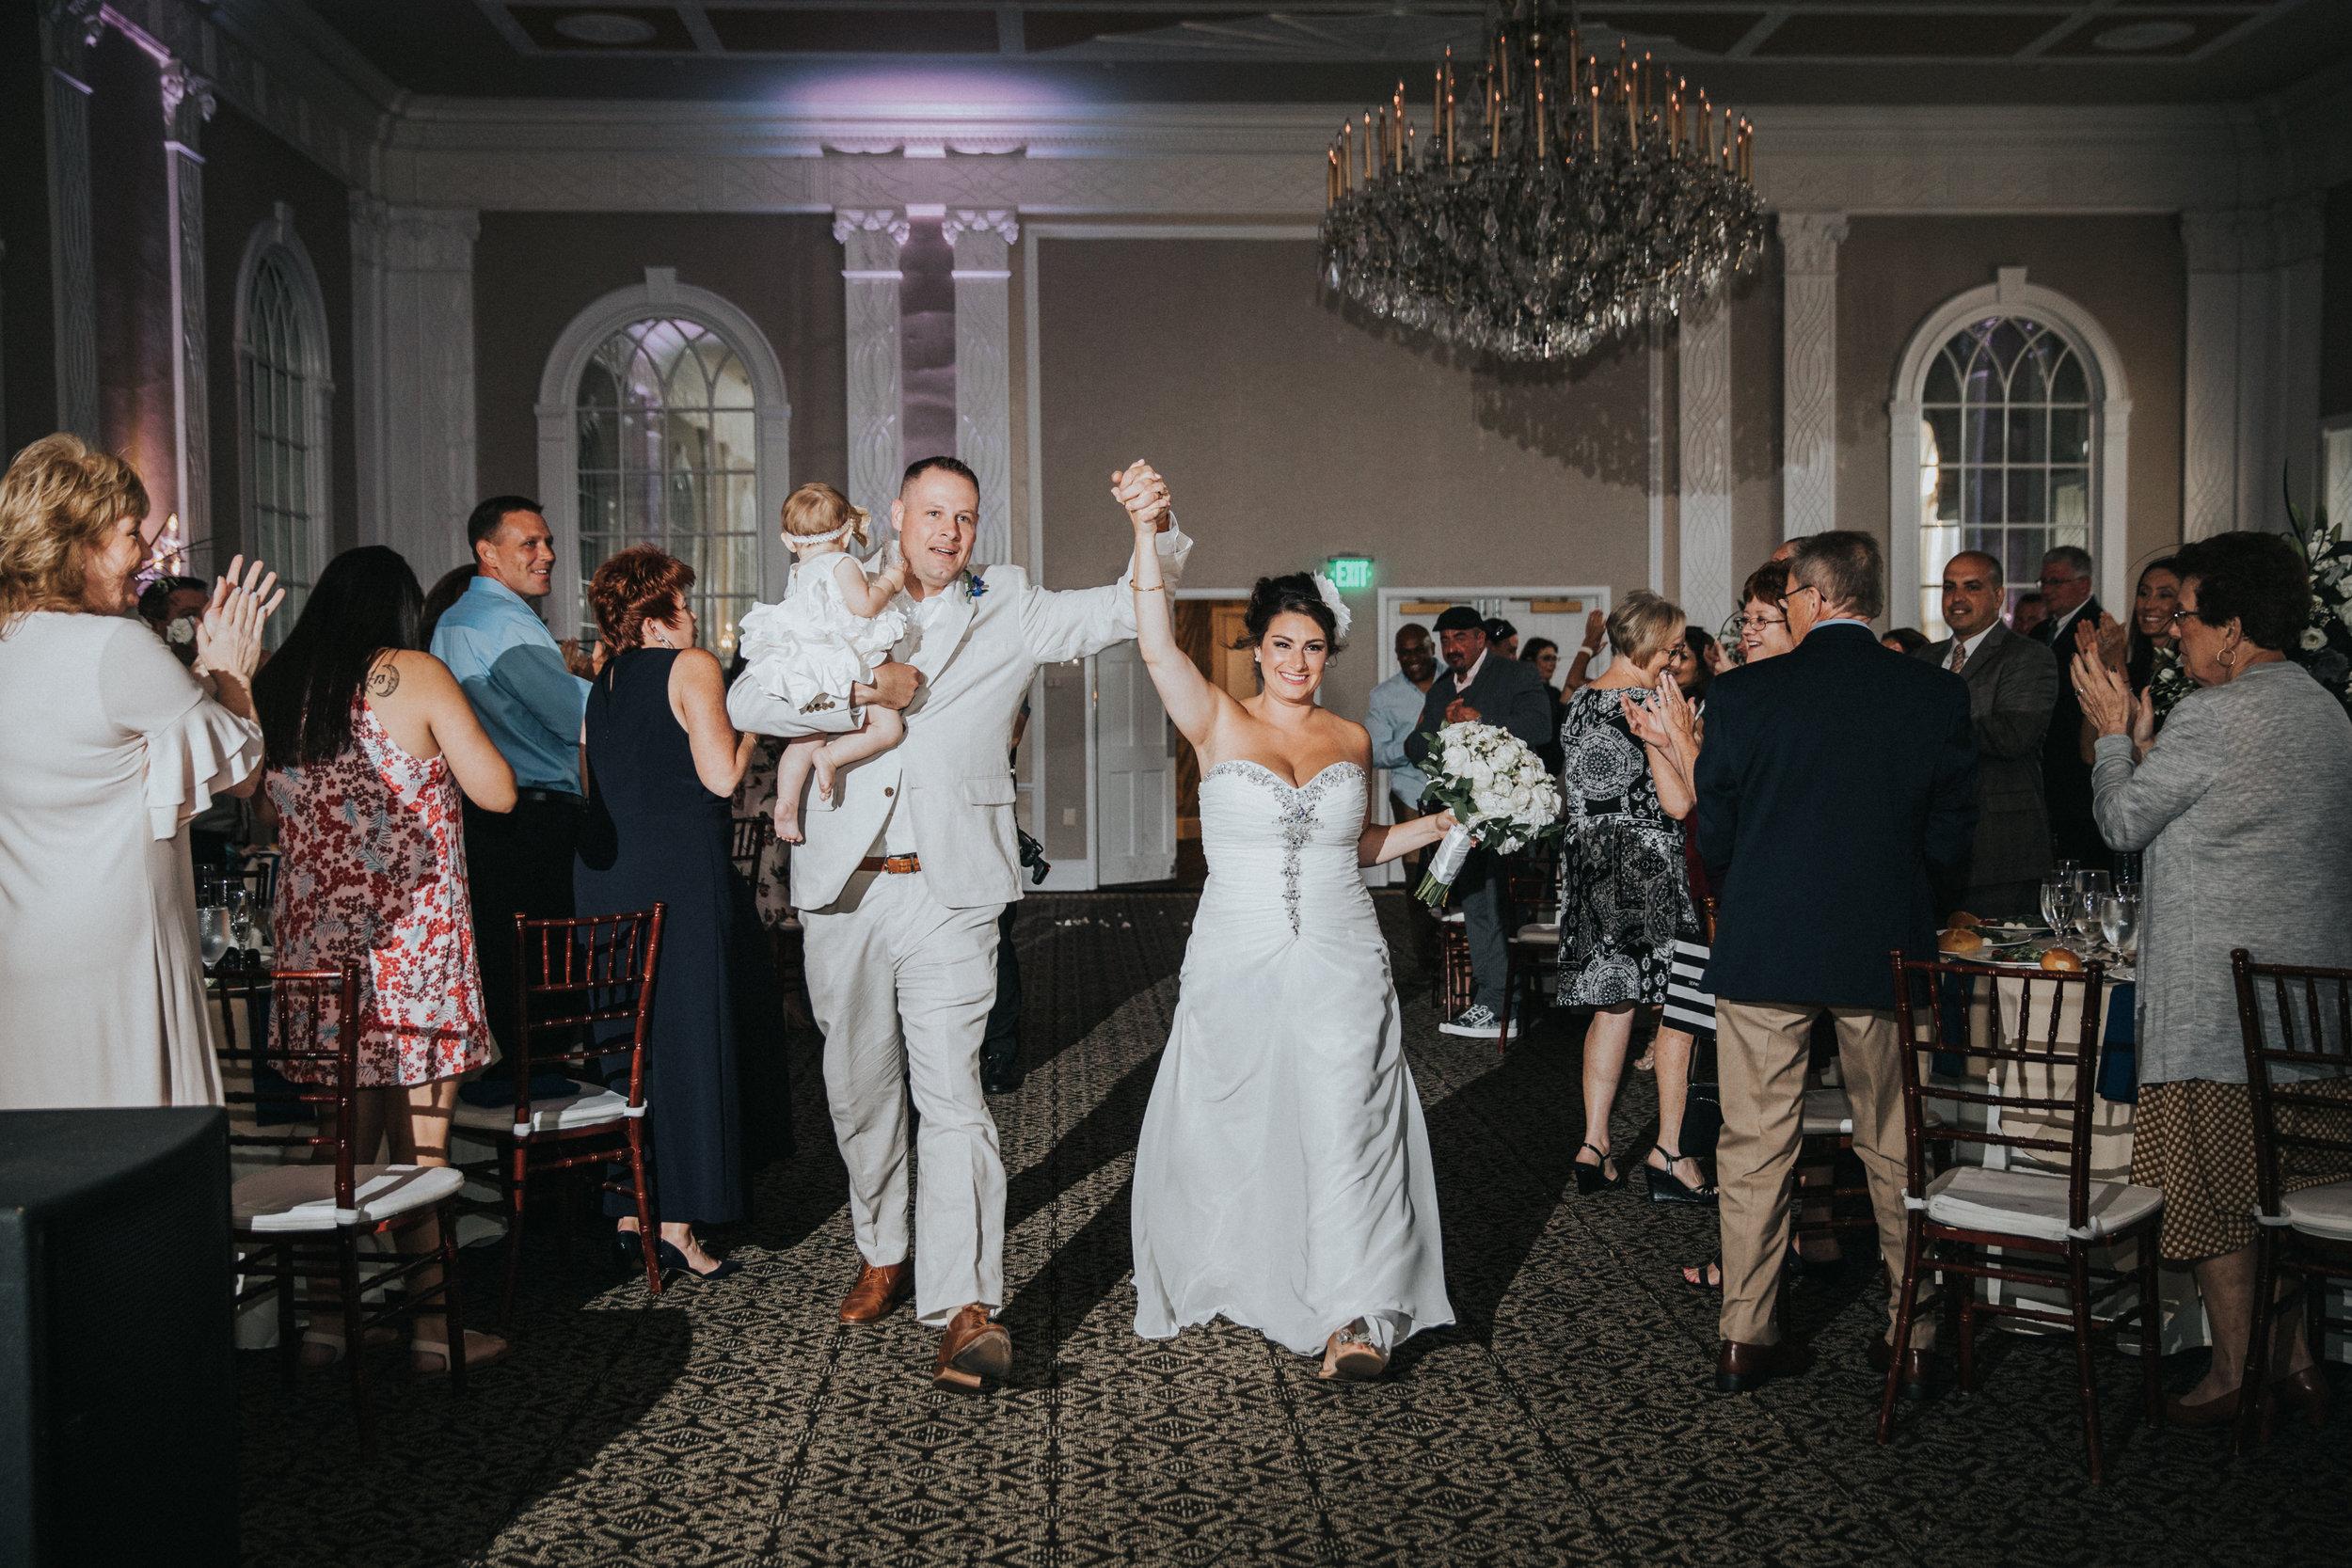 JennaLynnPhotography-NJWeddingPhotographer-Wedding-TheBerkeley-AsburyPark-Allison&Michael-Reception-15.jpg